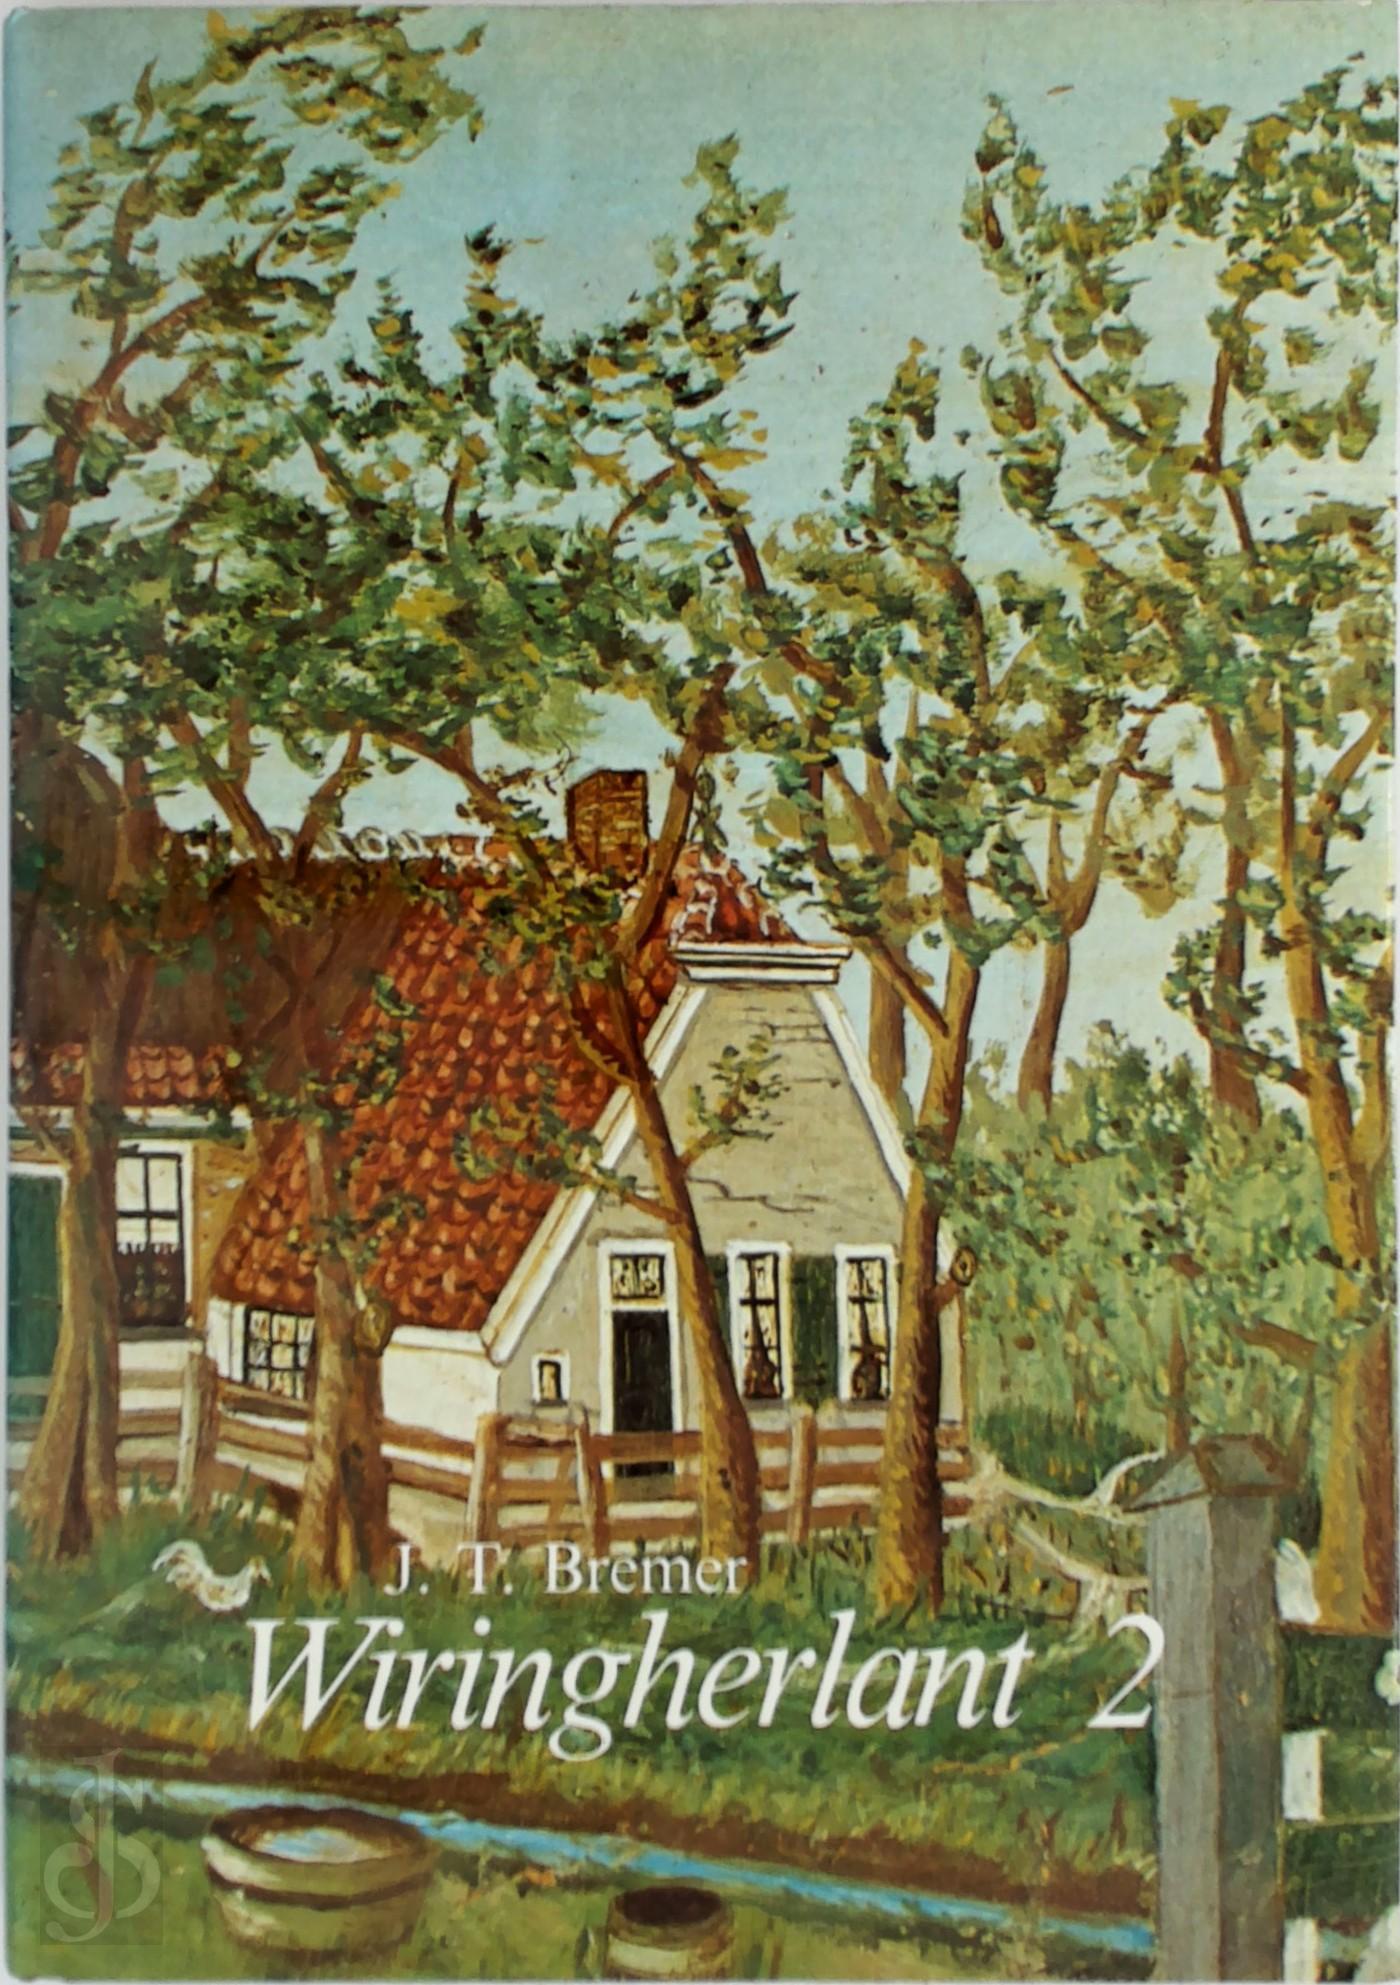 Bremer - Wiringherlant 2